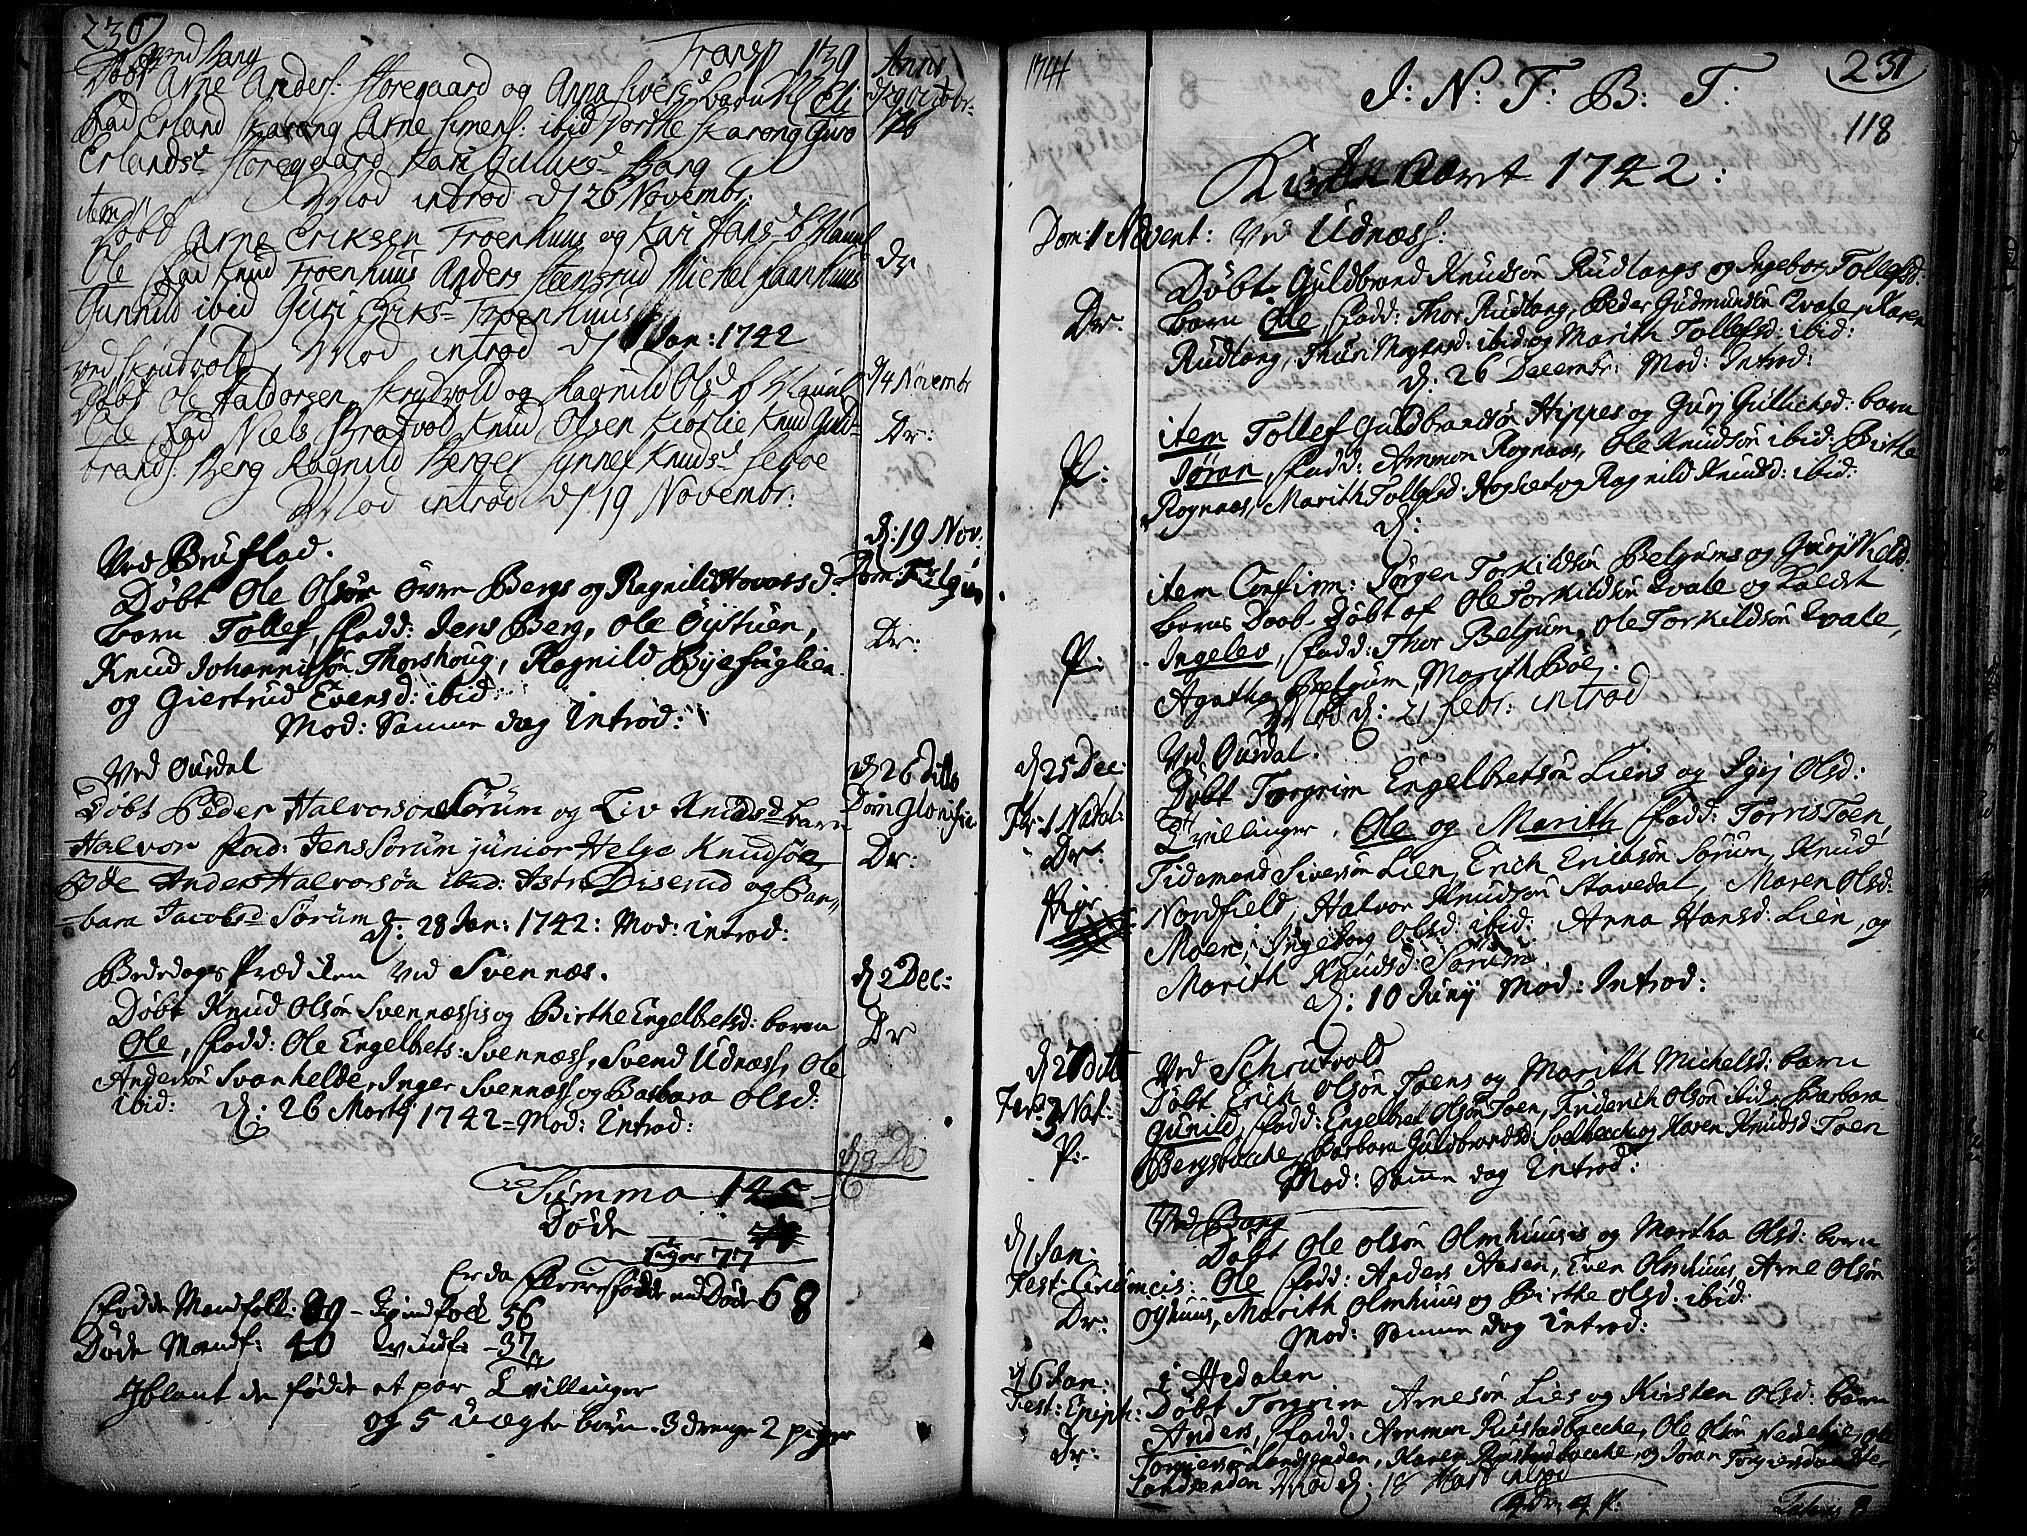 SAH, Aurdal prestekontor, Ministerialbok nr. 4, 1730-1762, s. 236-237